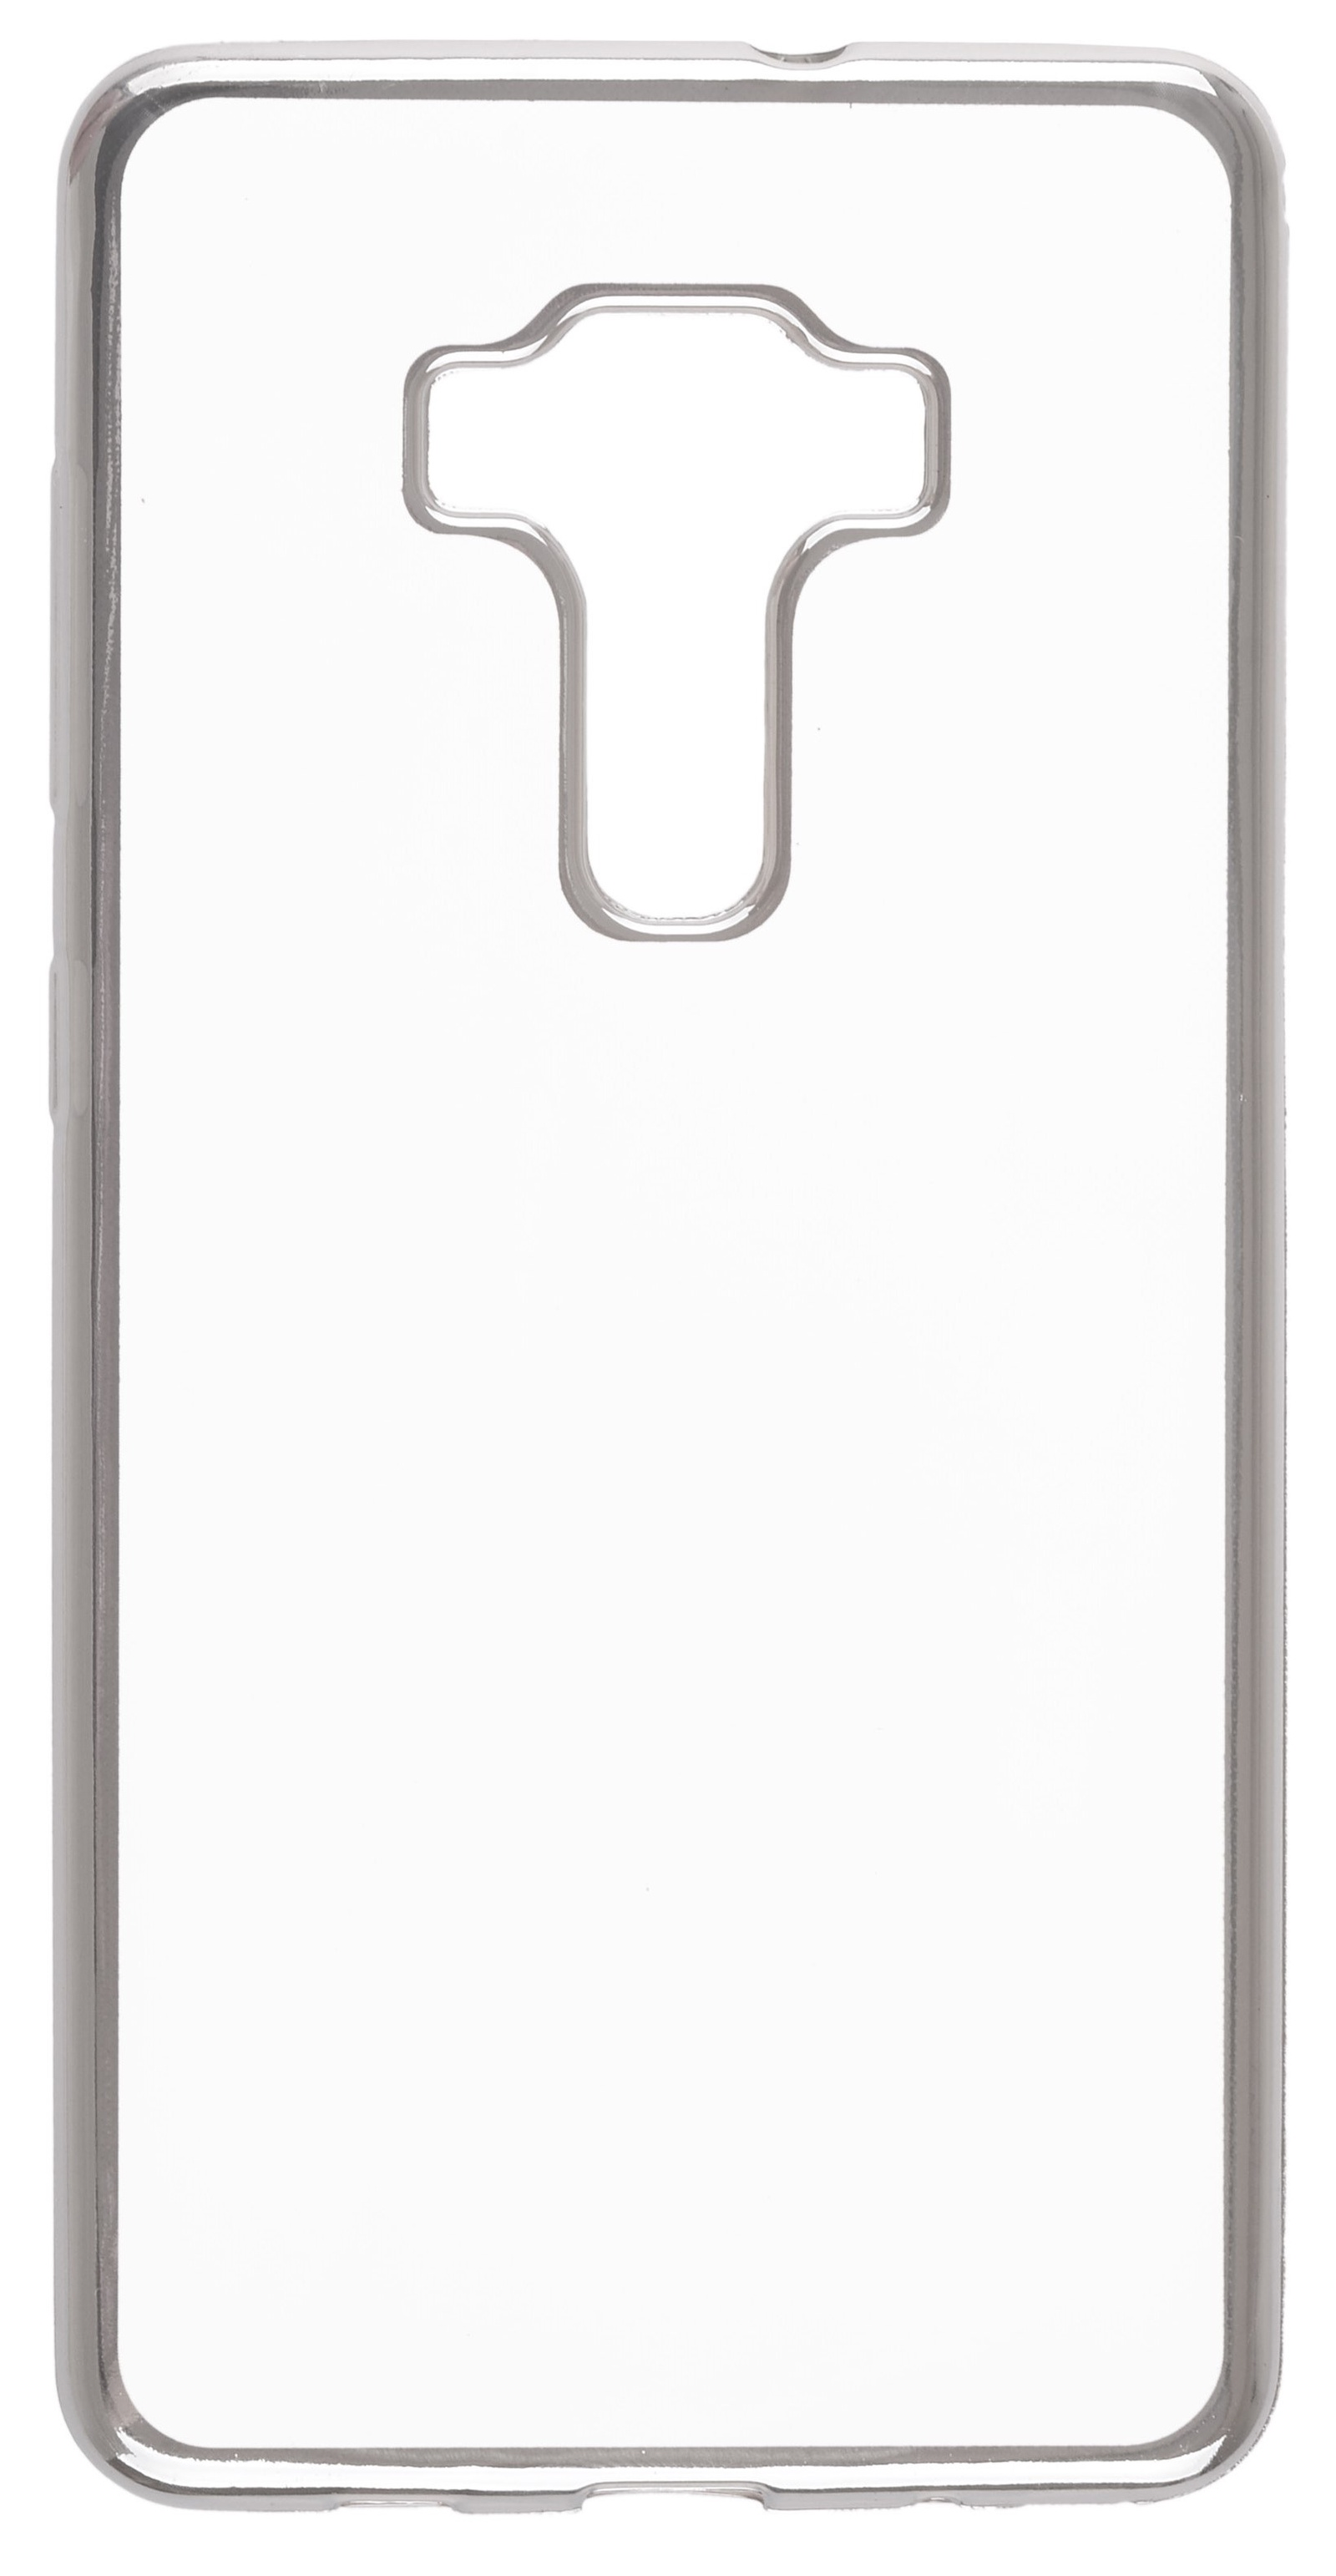 Чехол для сотового телефона skinBOX Silicone chrome border, 4630042528710, серебристый